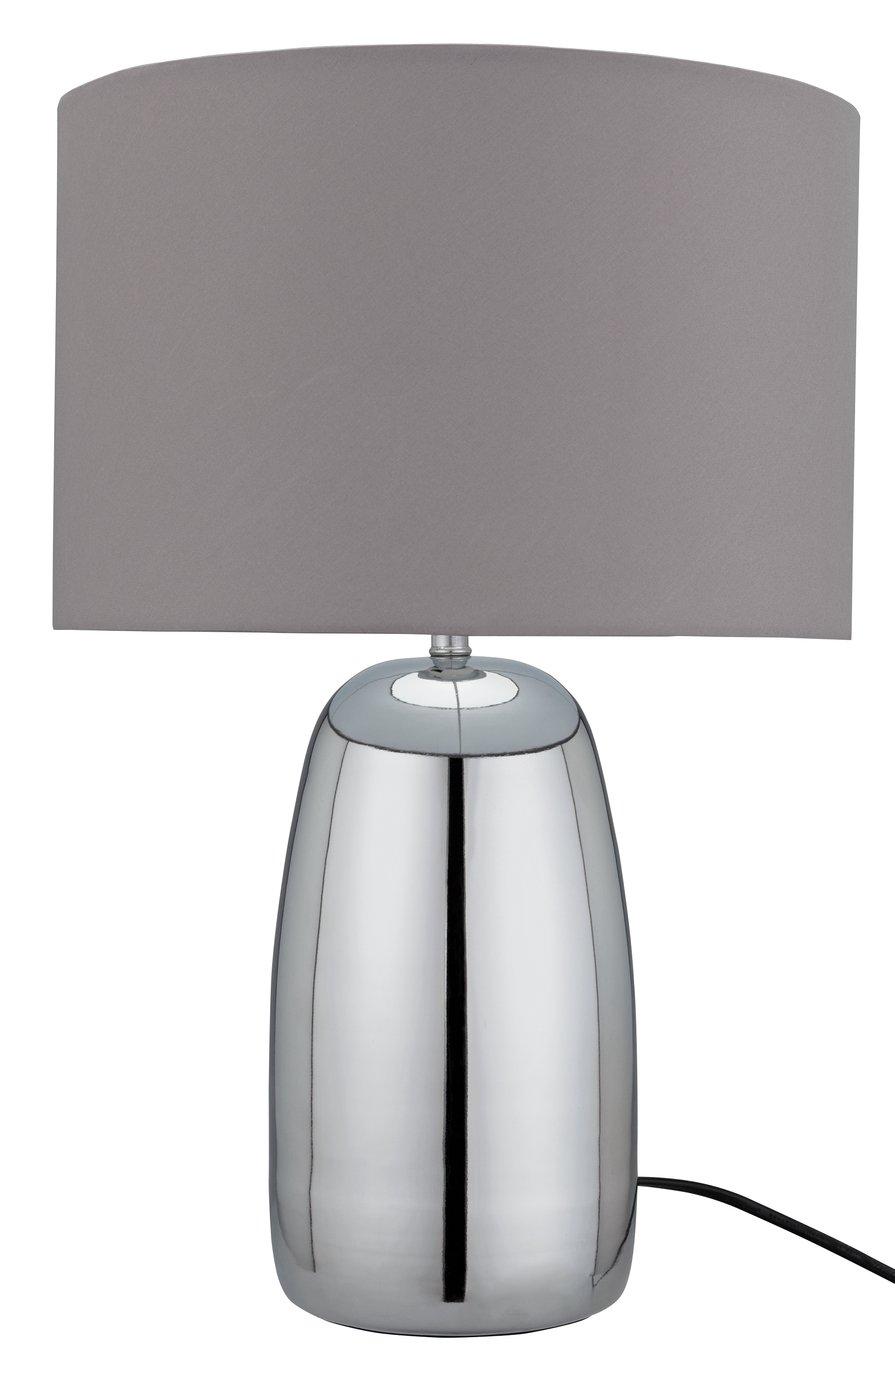 Argos Home Largo Touch Table Lamp - Grey & Chrome